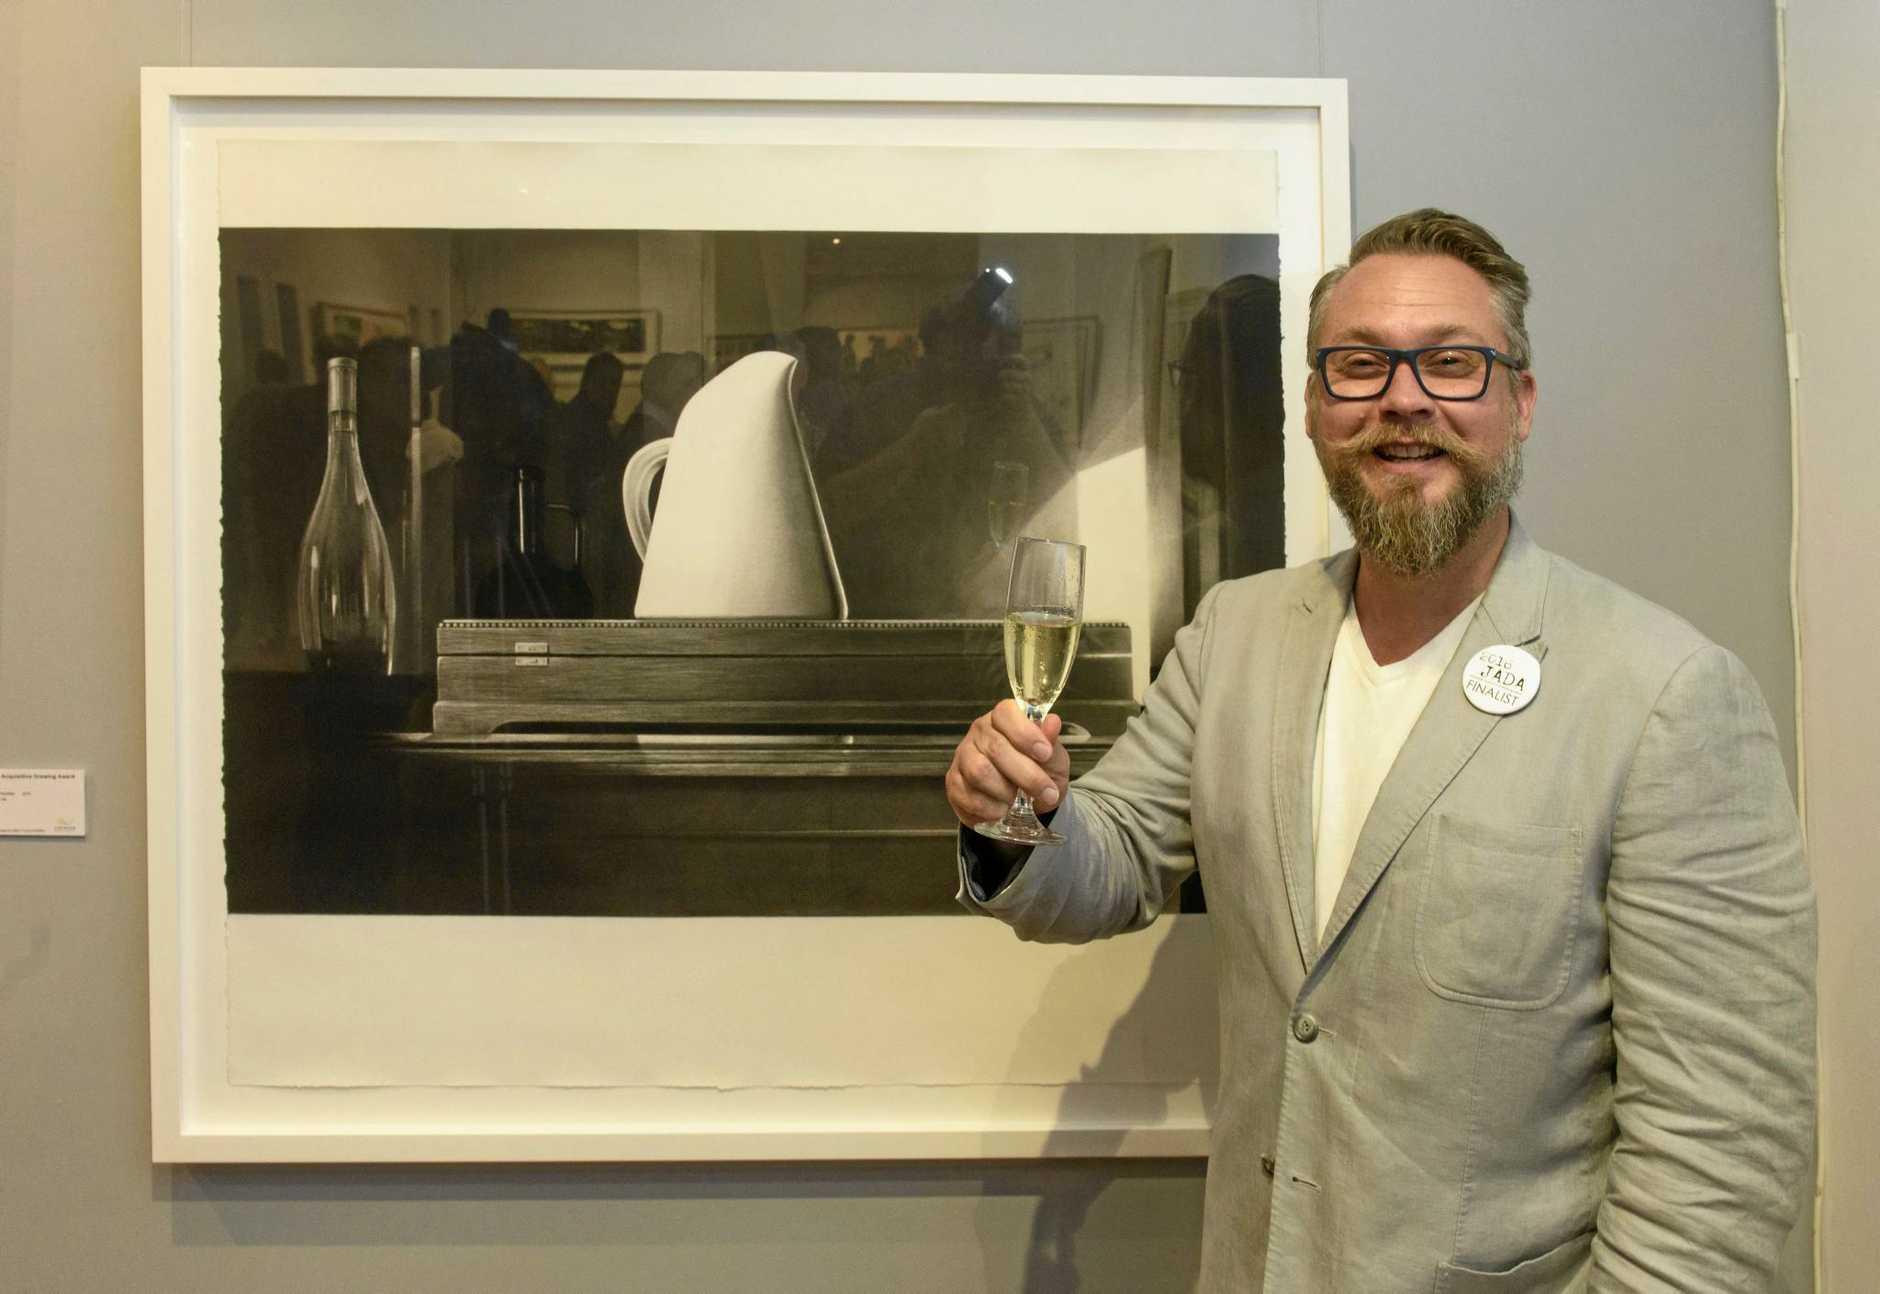 2016 JADA finalist Adam Cusack